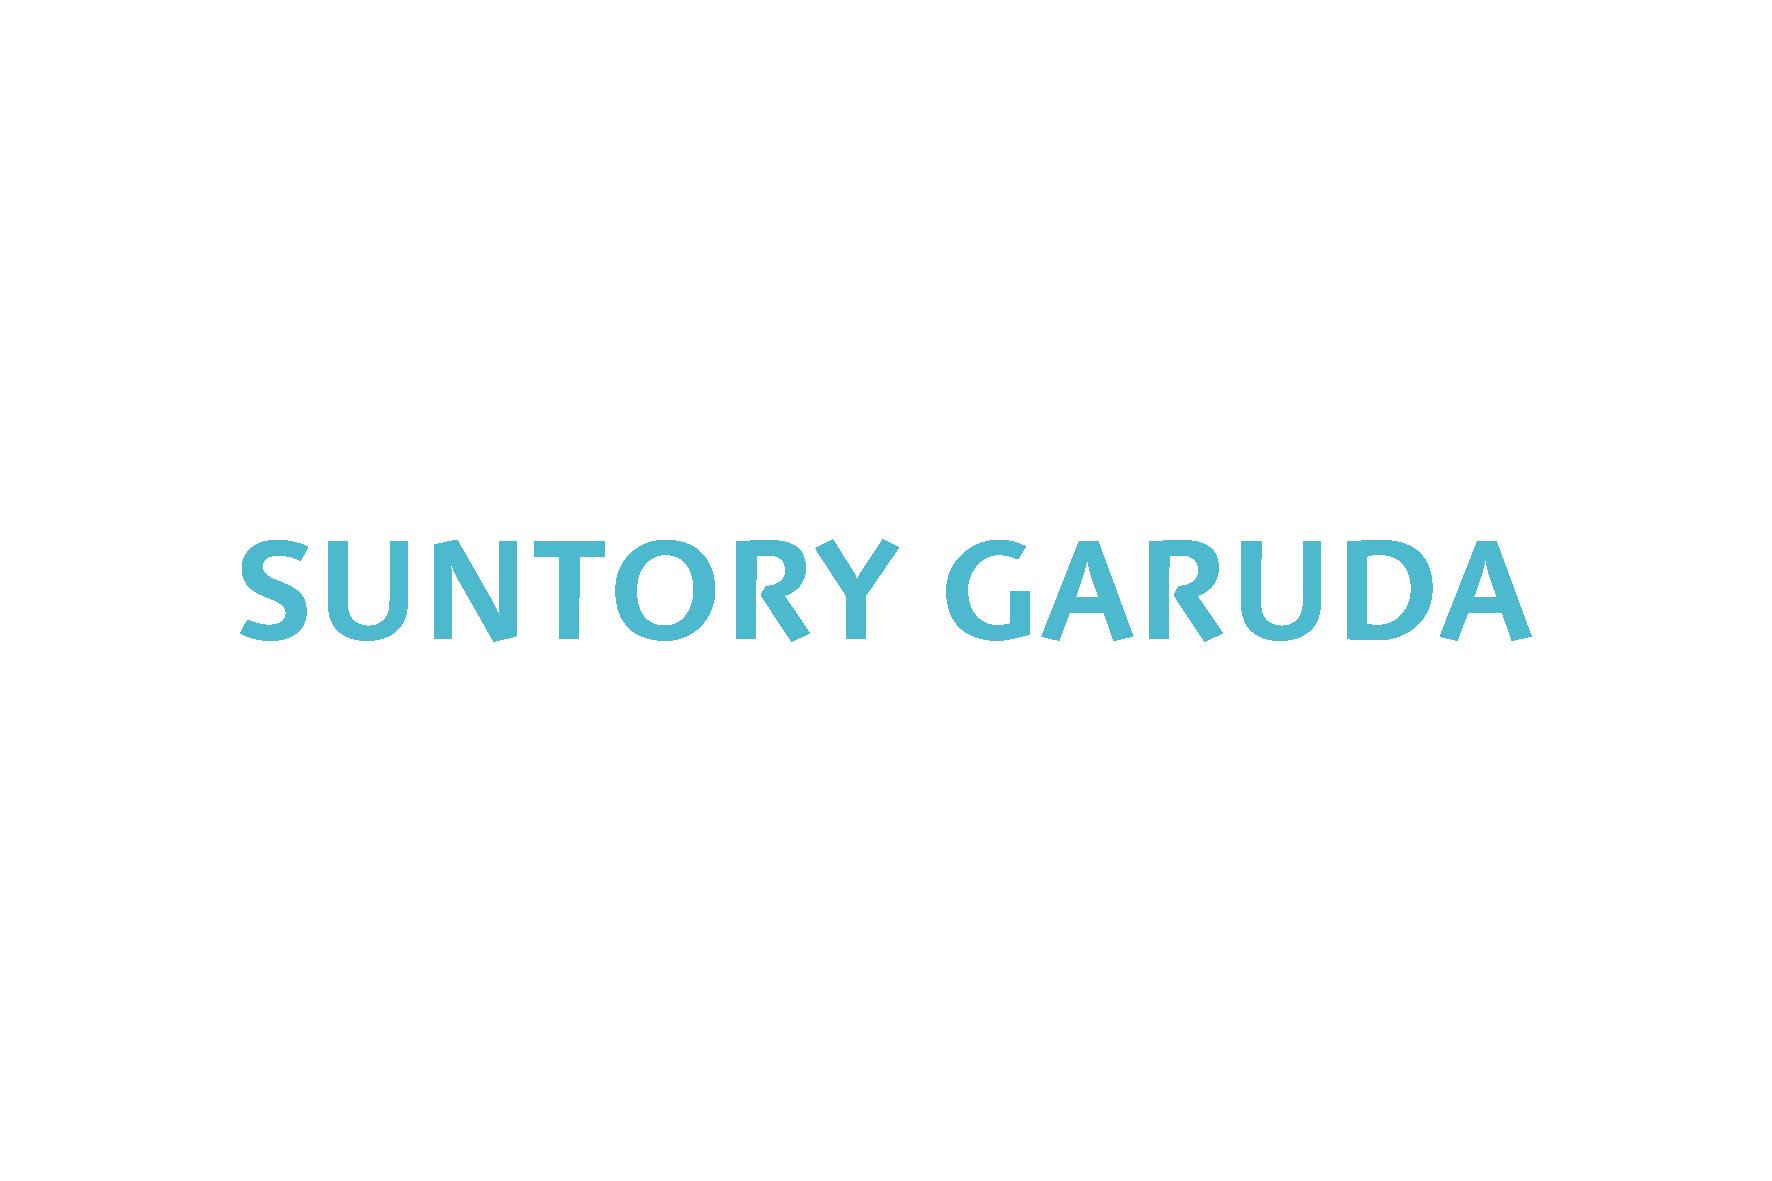 Suntory Garuda